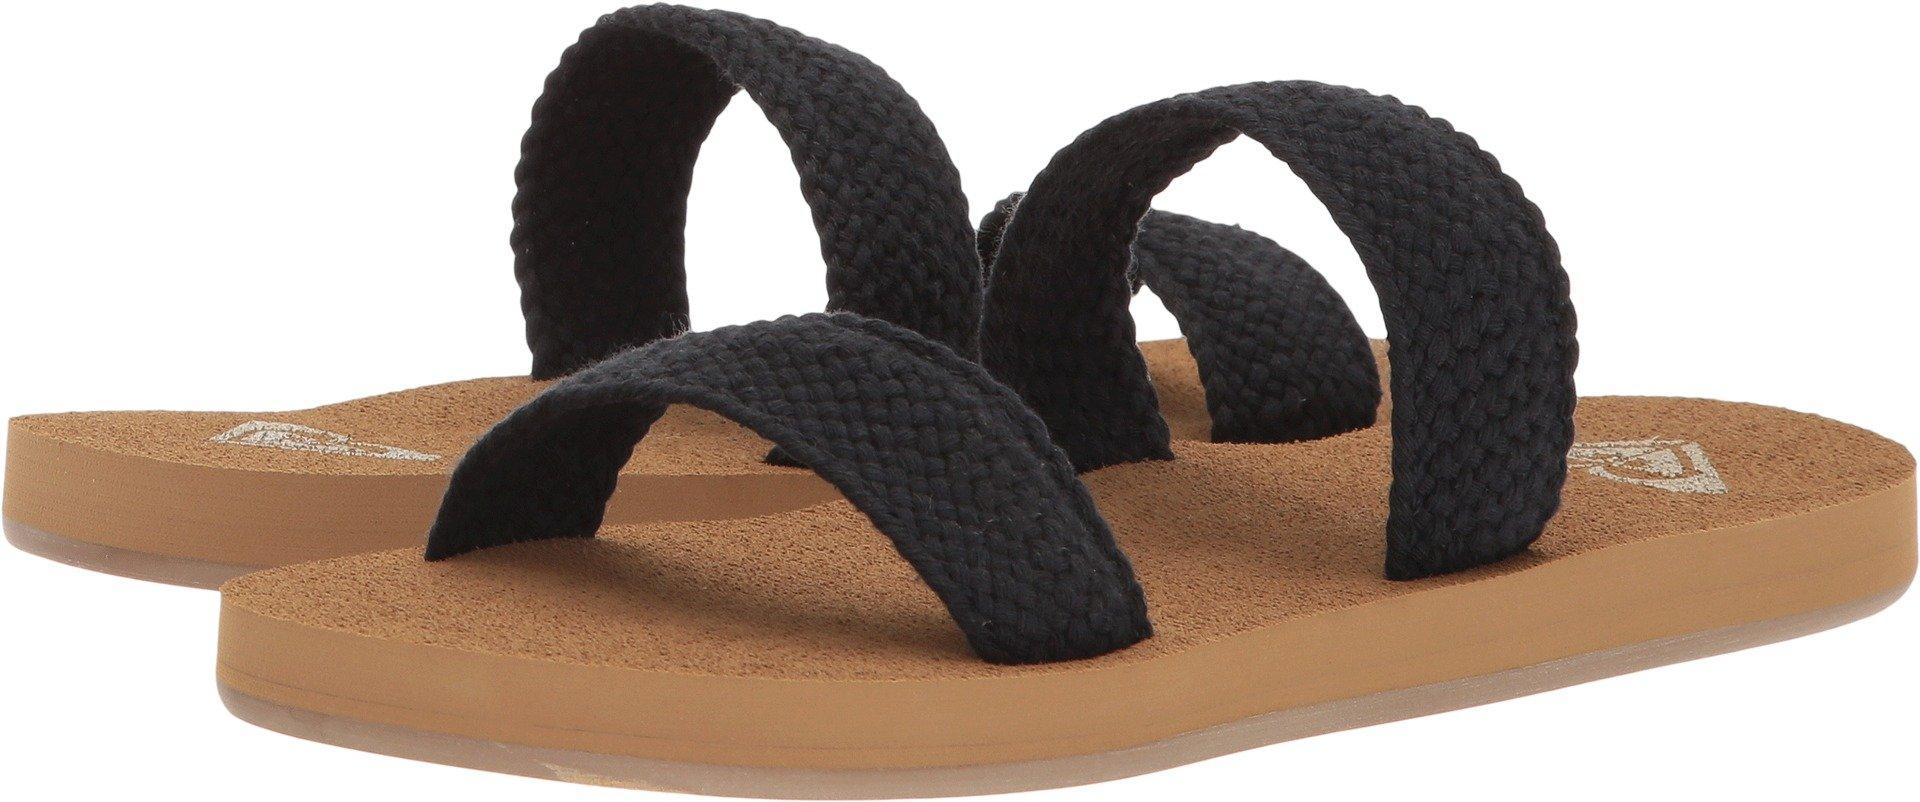 Roxy Women's Sanibel Slide Sandal, Black, 9 M US